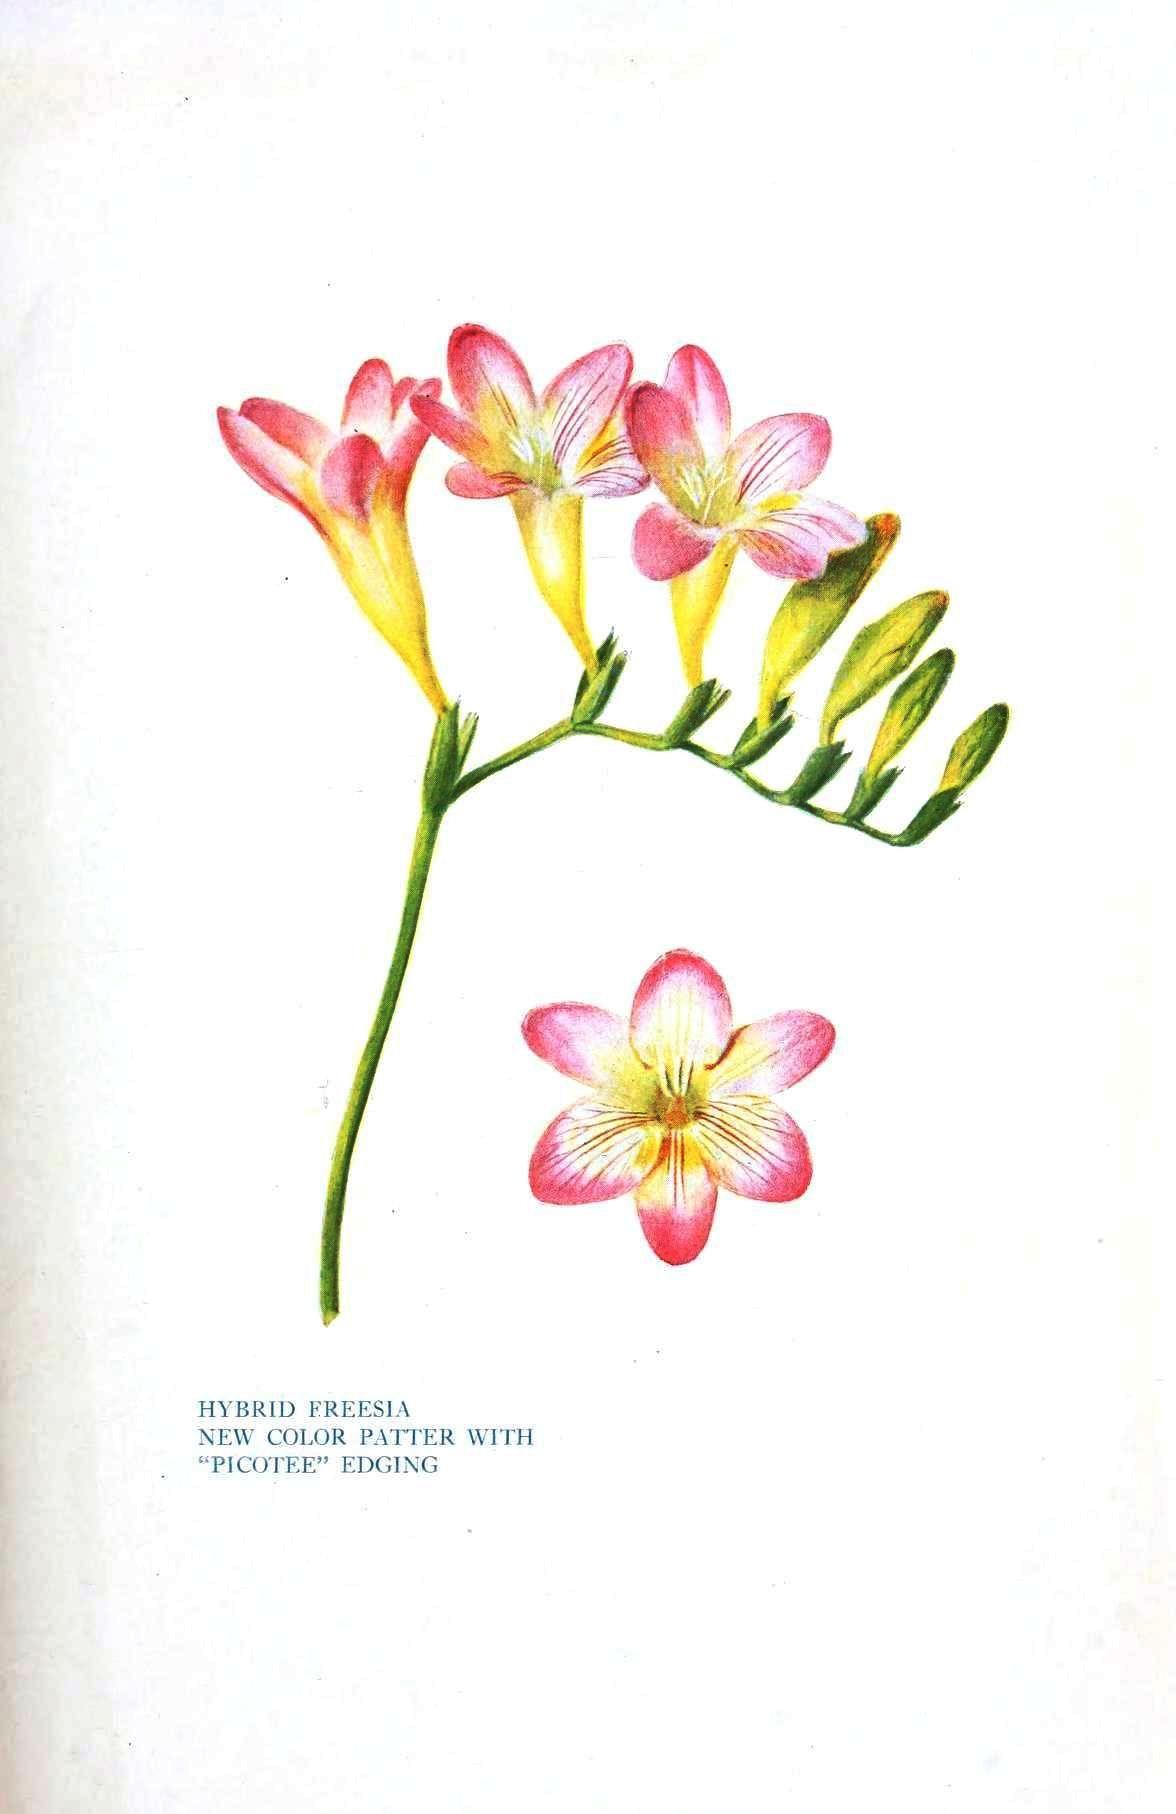 Botanical Flower Freesia New Type Botanical Flowers Botanical Illustration Watercolor Watercolor Flowers Tutorial